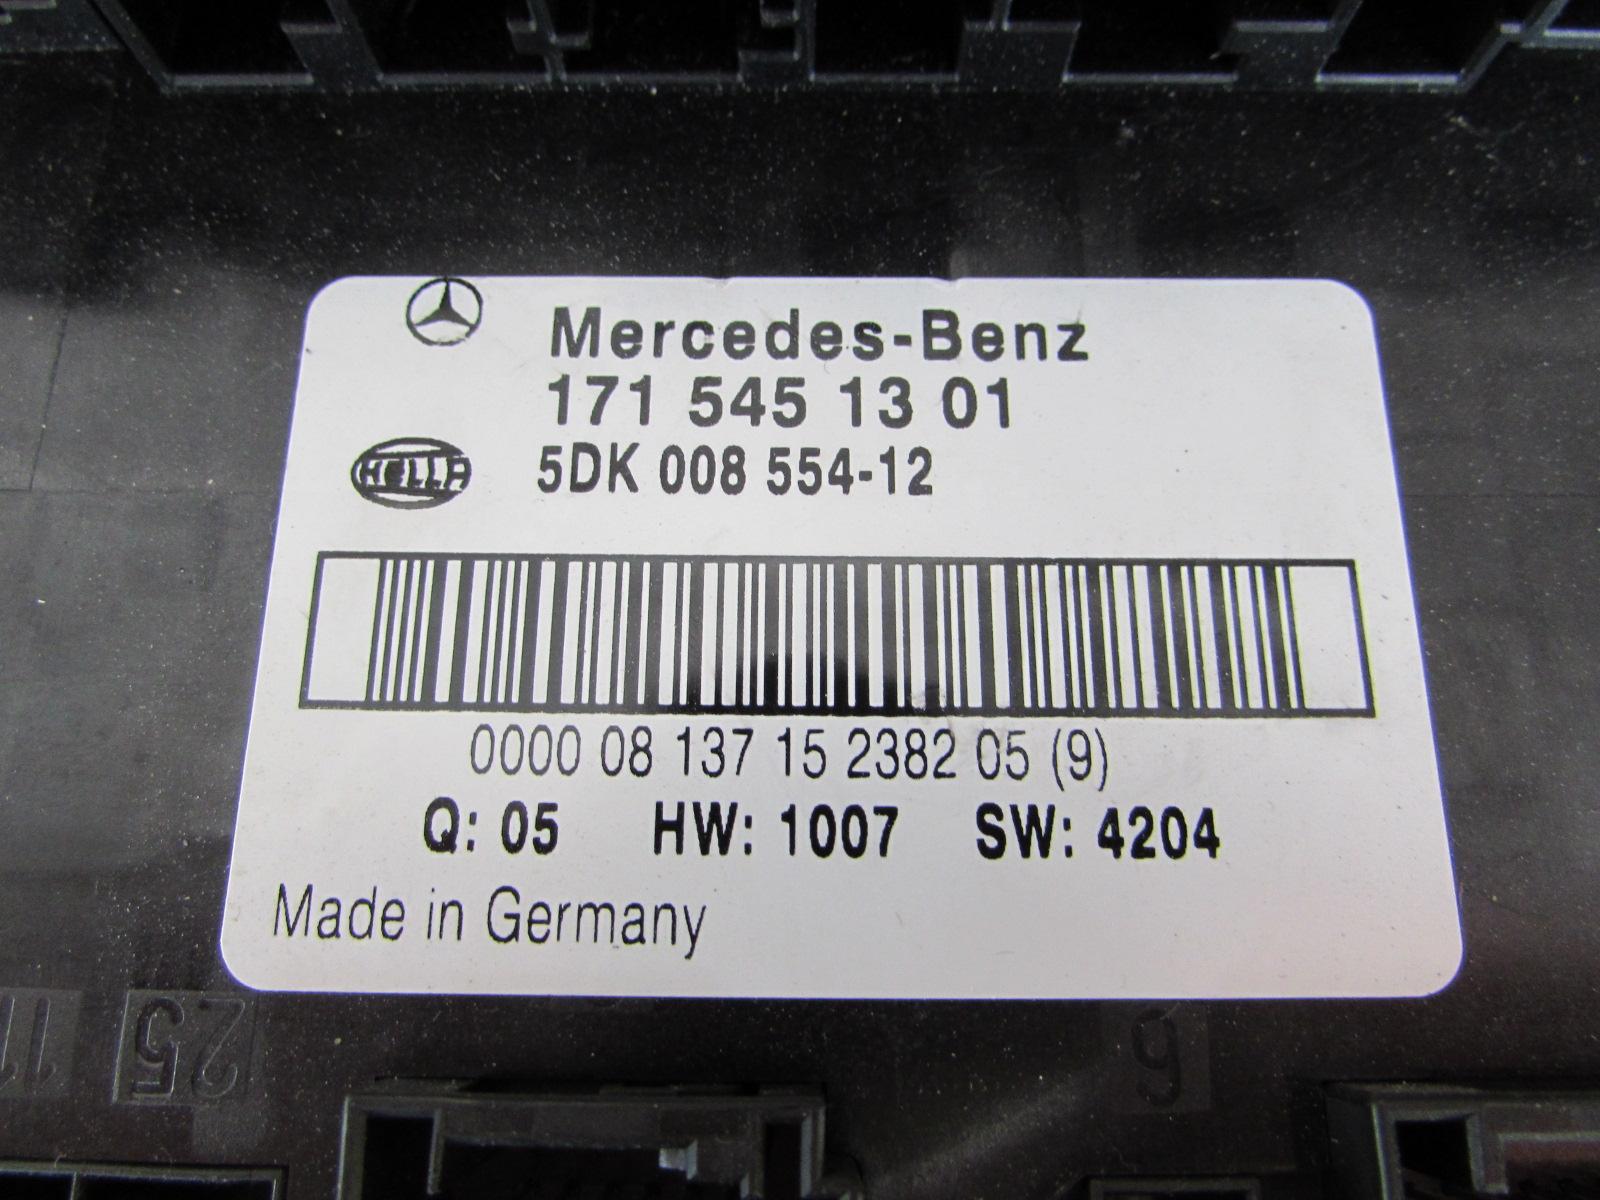 Mercedes R171 Electrical Center Fuse Block Box 1715451301 Slk280 Slk300 Slk350 Slk553